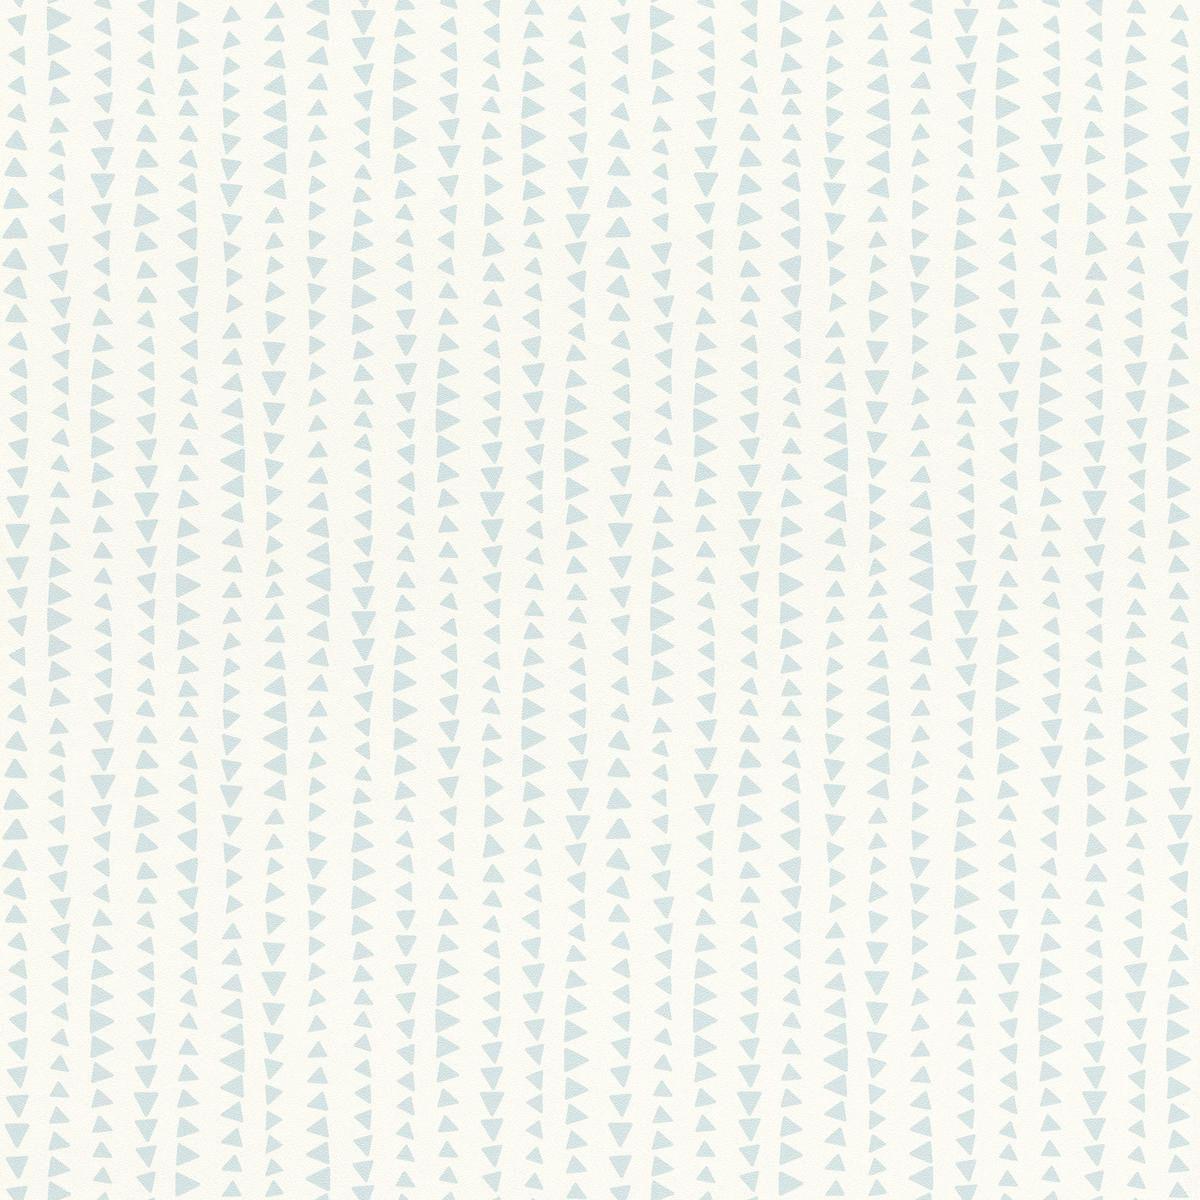 Papel de Parede Bambino XVIII Triângulos 249132 - Rolo: 10m x 0,53m